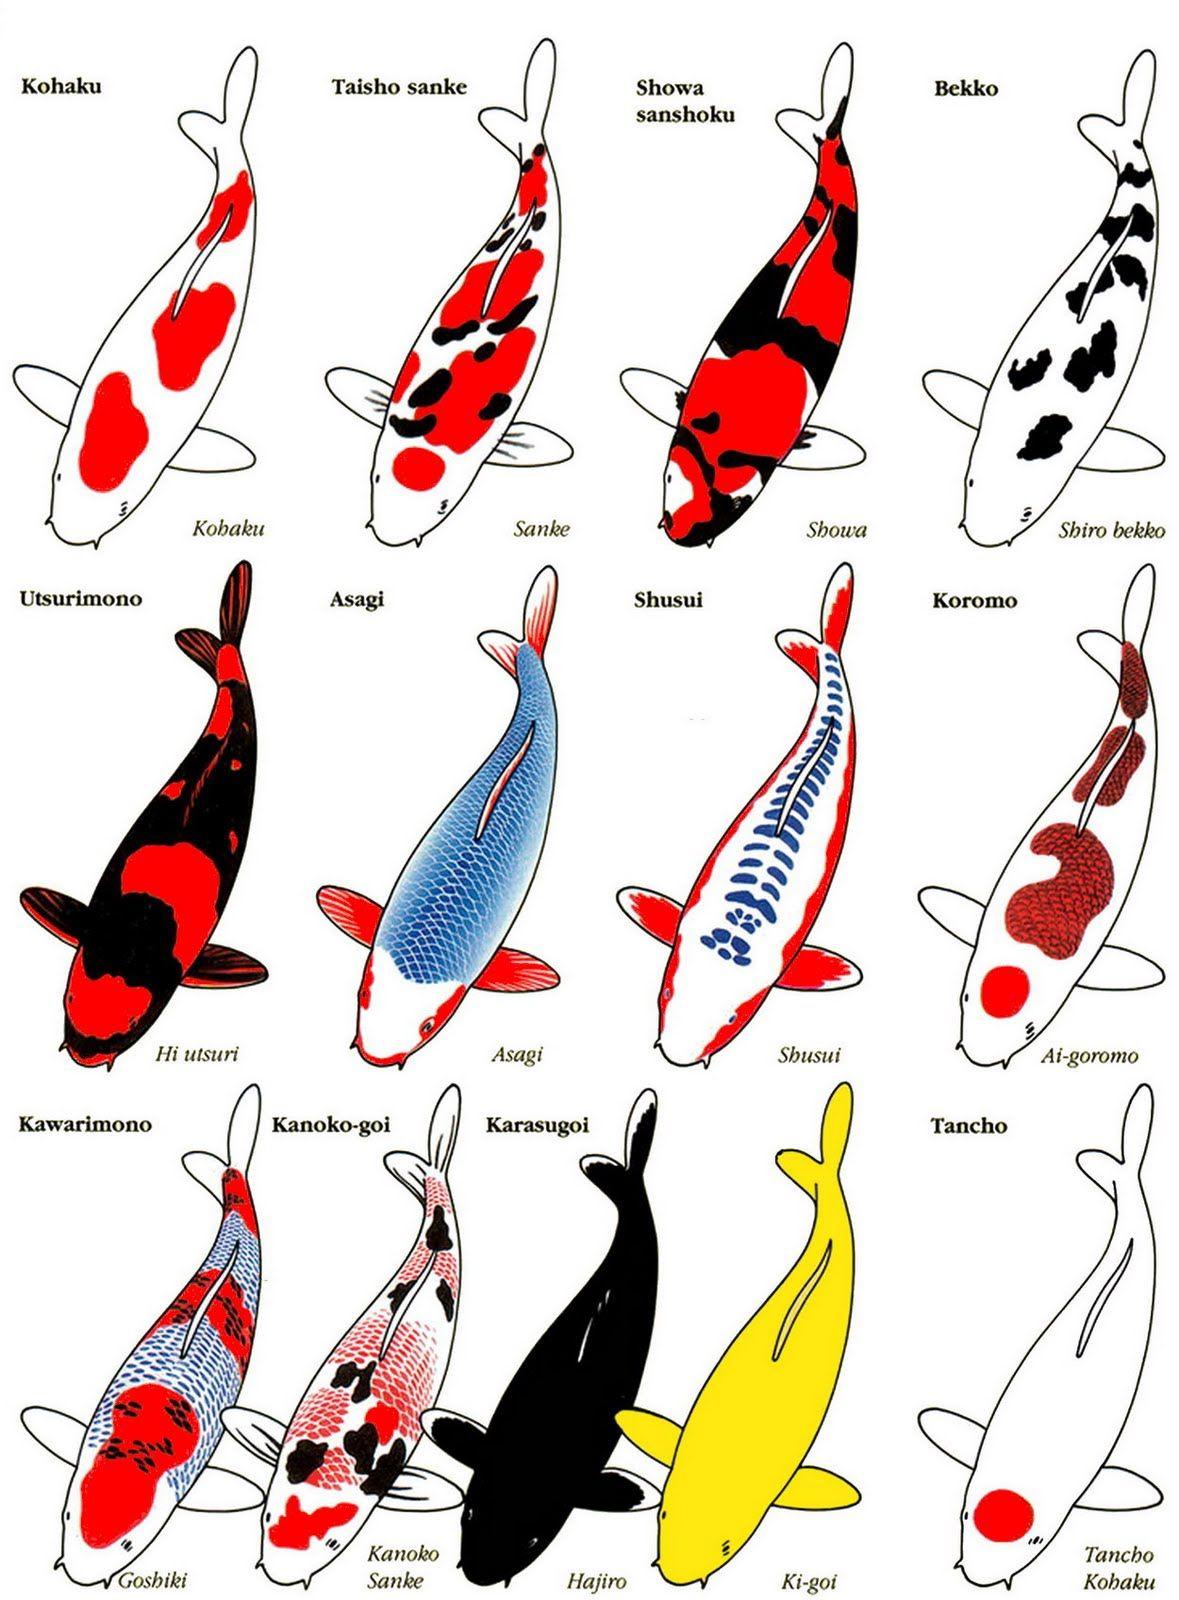 hight resolution of slighted koi ponds koi koi fish pond koi carp salmon life cycle koi fish life cycle diagram